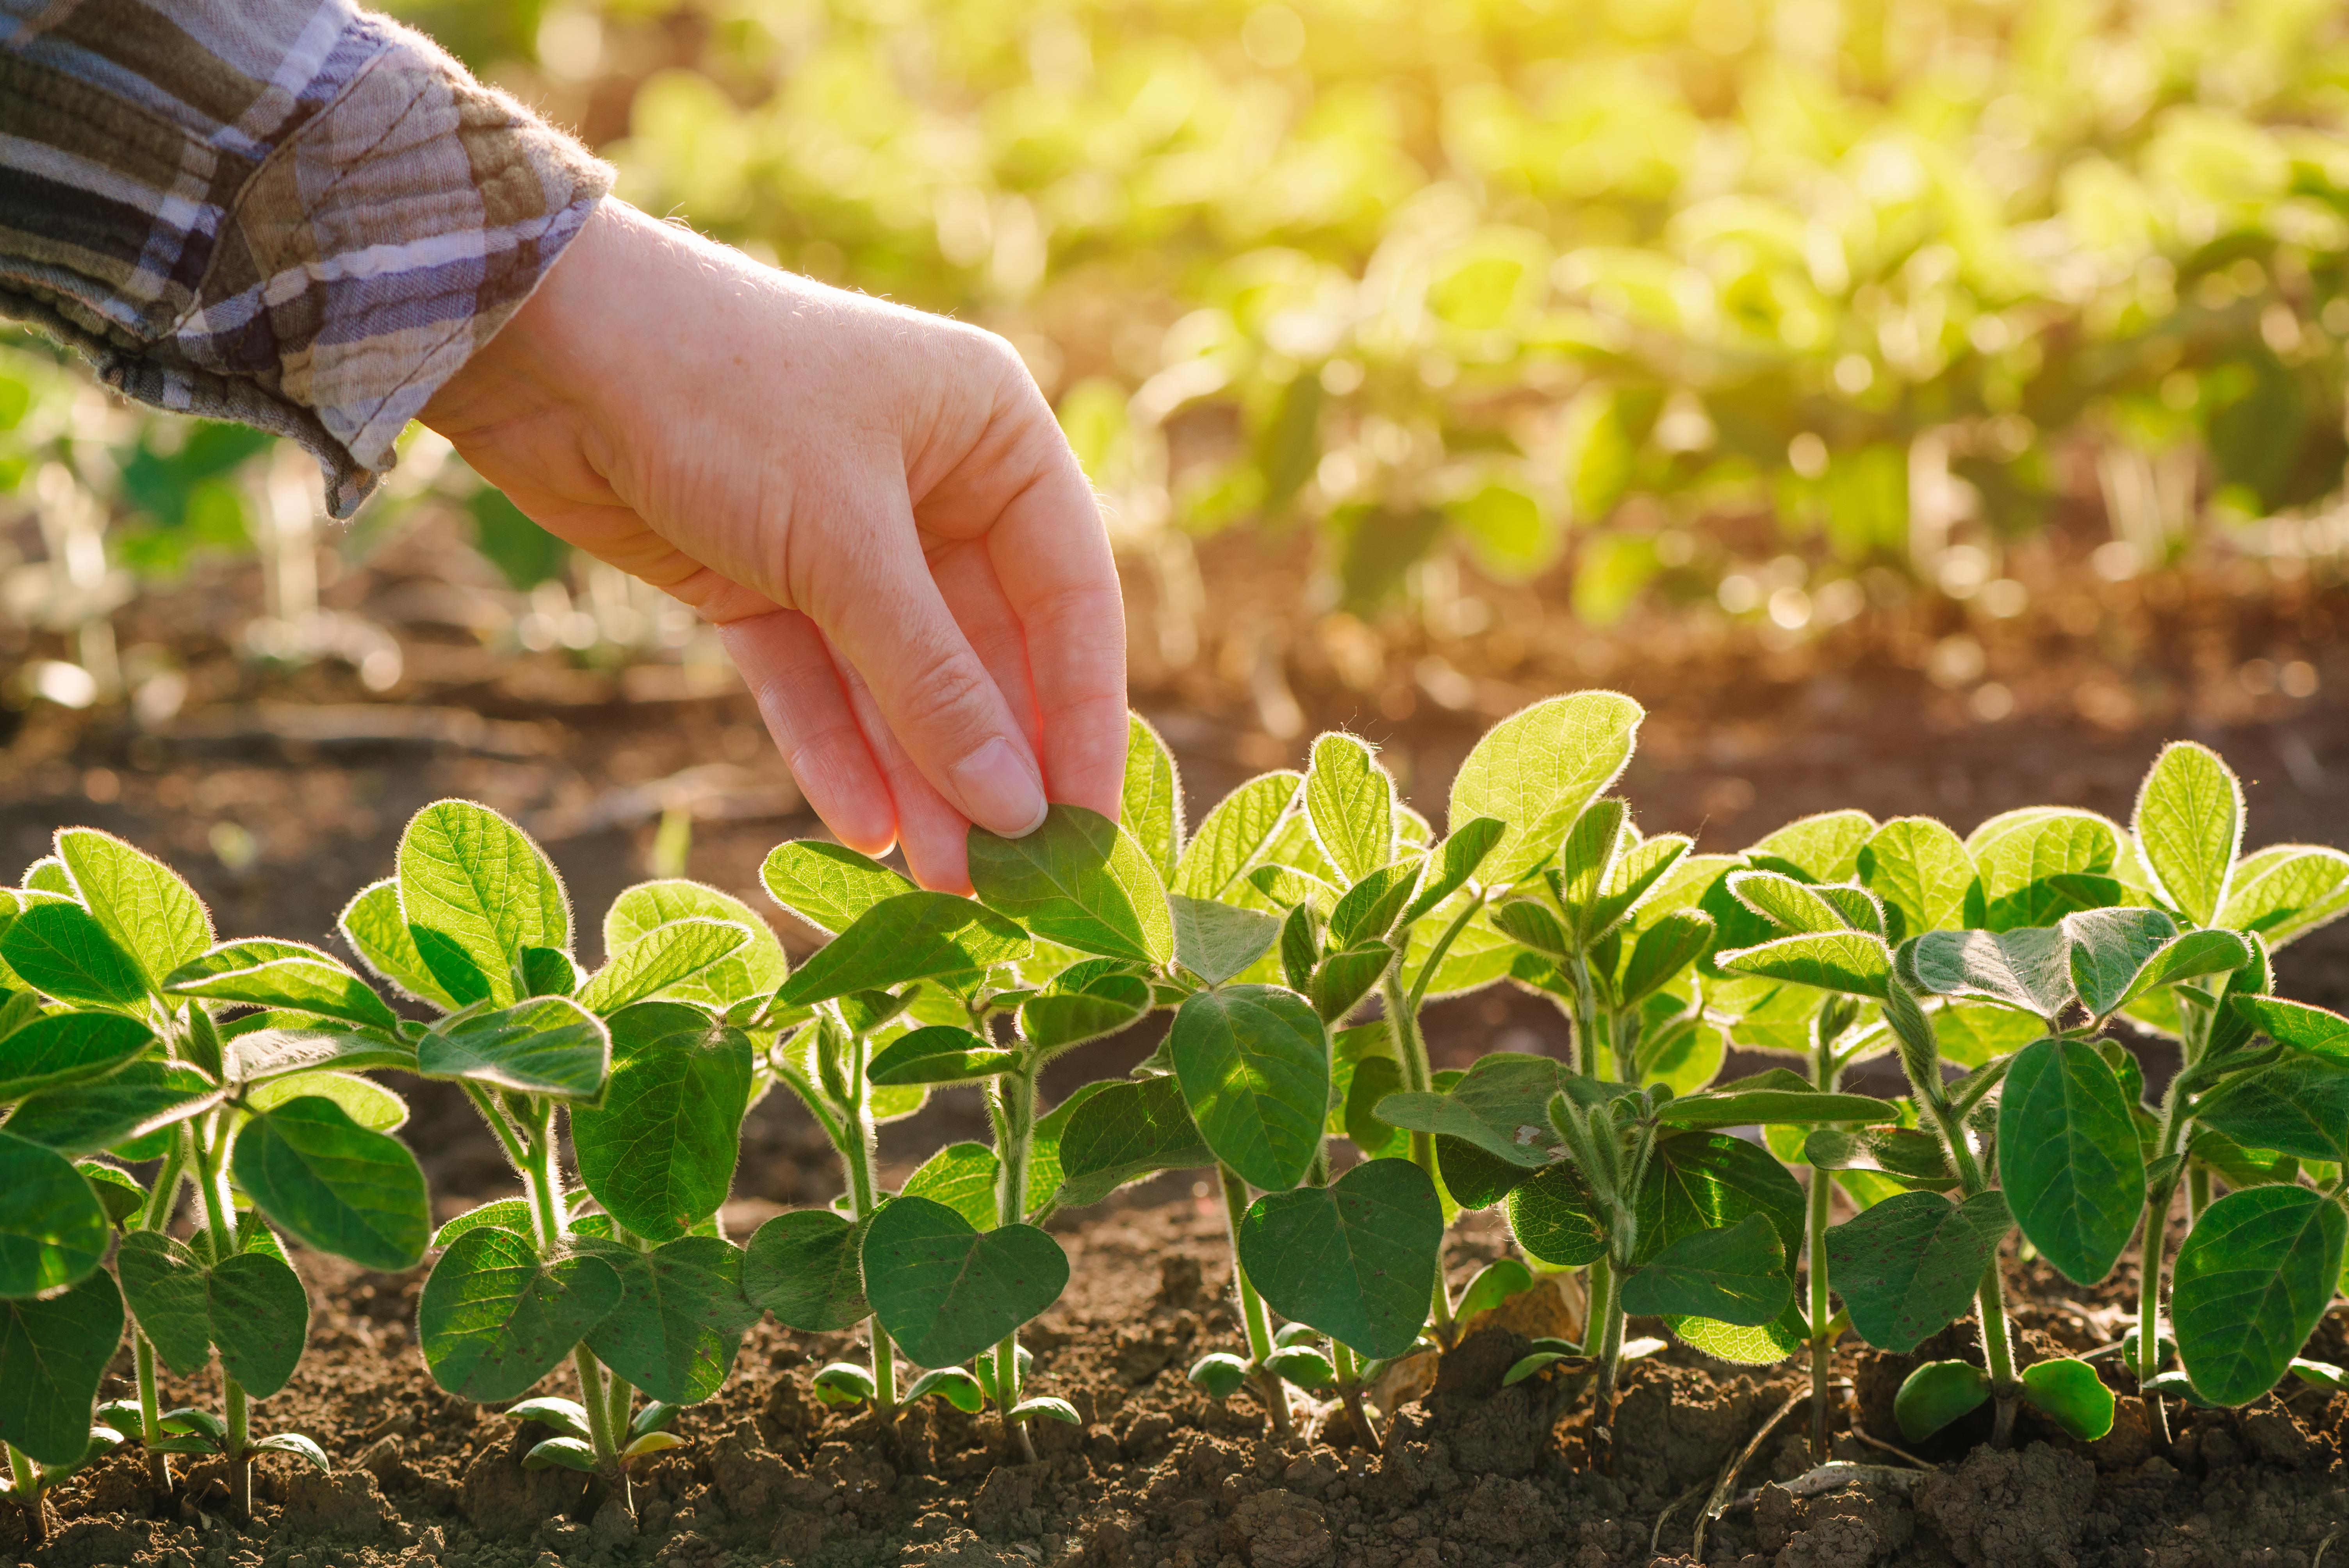 close-up-of-female-farmer-hand-examining-soybean-PCZDDL6